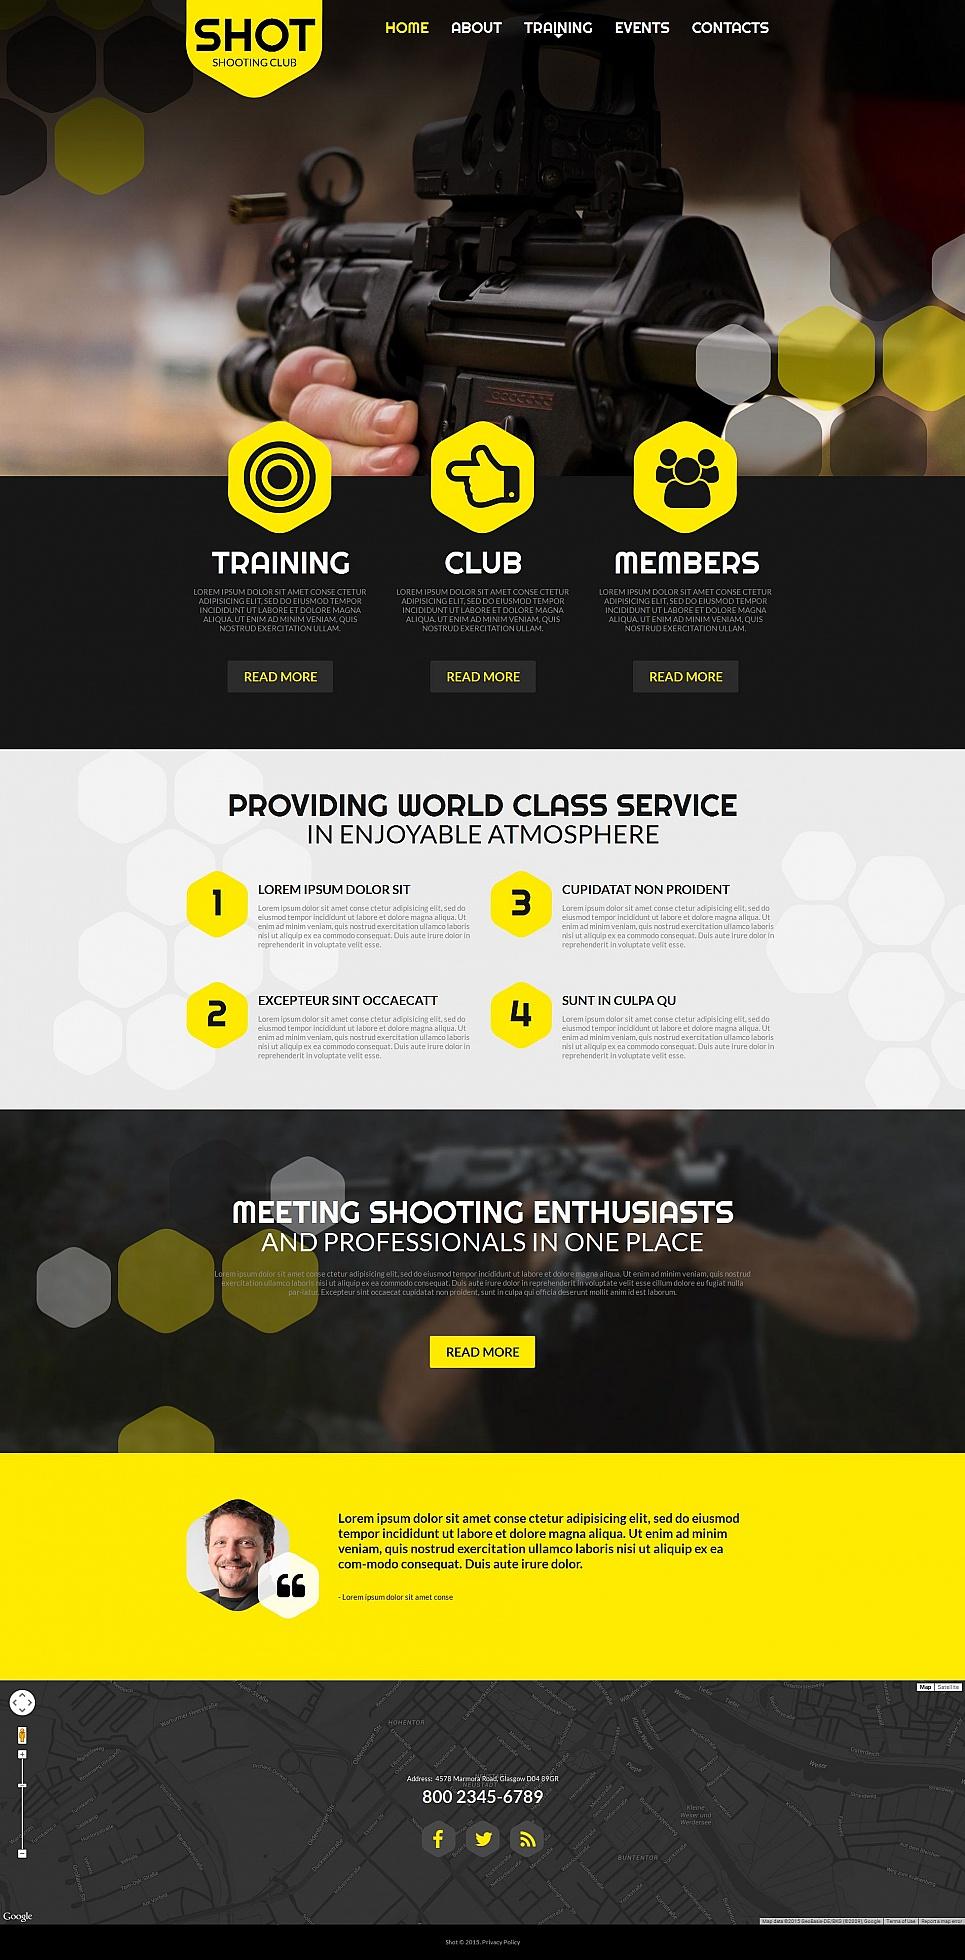 MotoCMS HTML Шаблон #55322 из категории Спорт - image